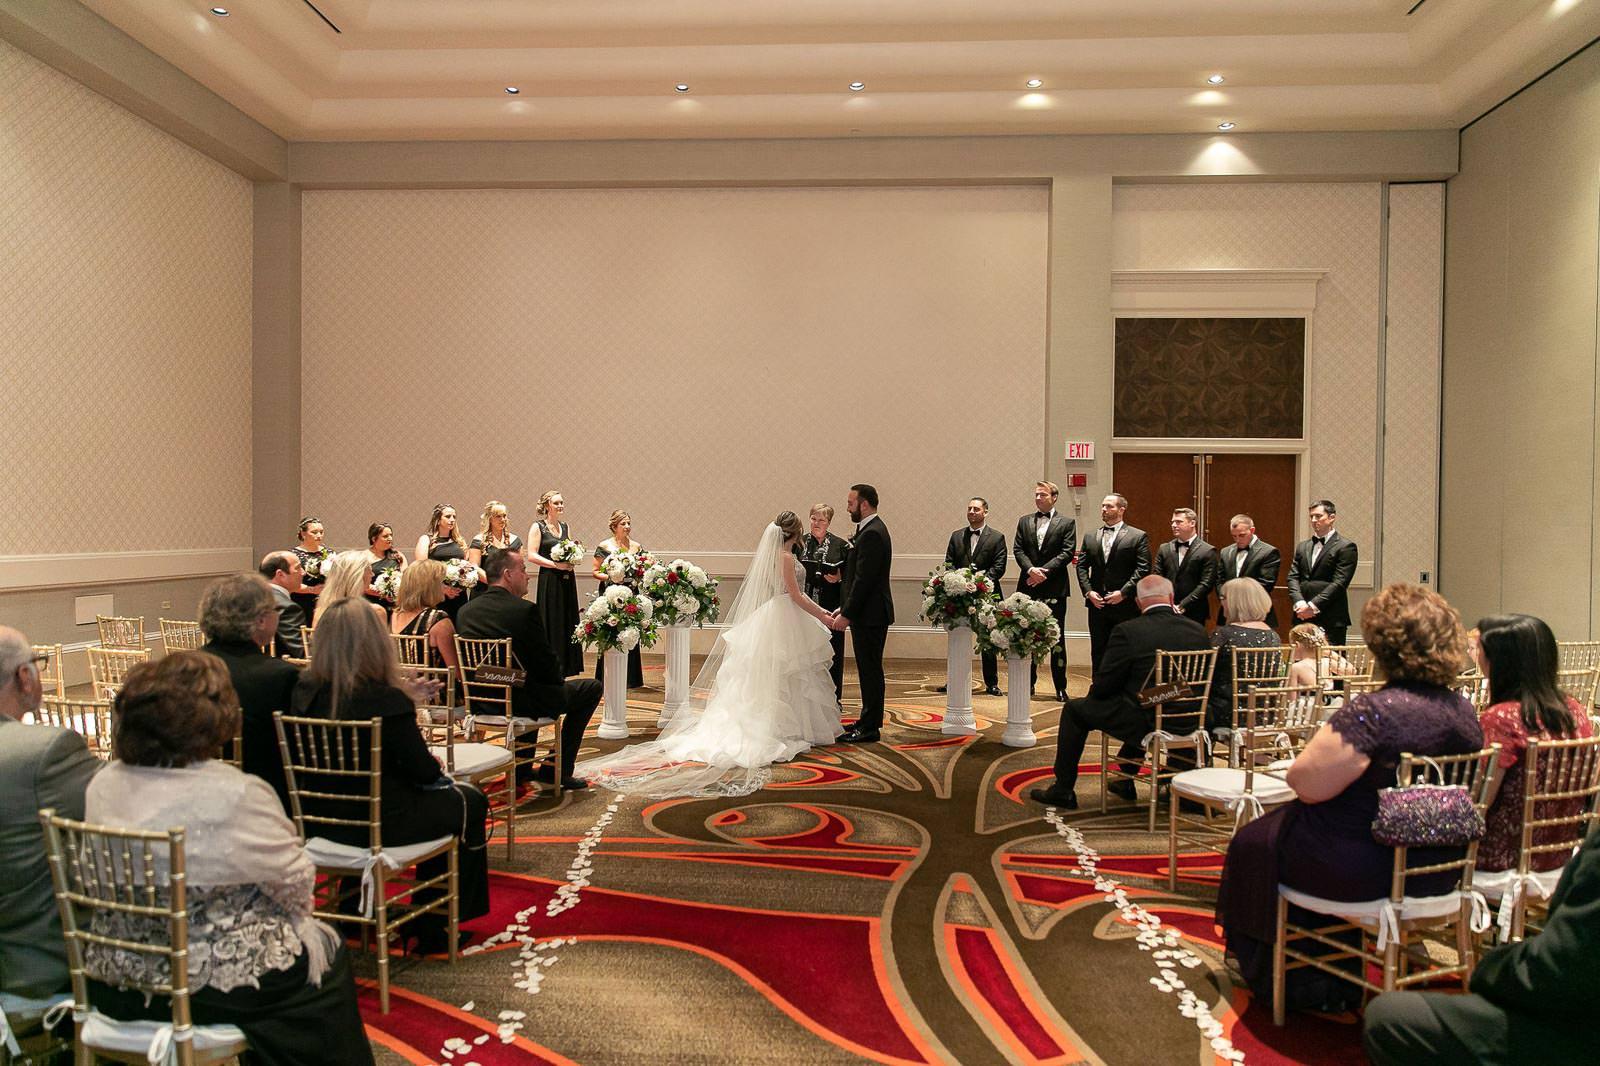 Omni Hotel Providence, Omni, Providence, Rhode Island, RI, Wedding, city wedding, November wedding, Tracy Jenkins Photography, RI wedding photographer, Rhode Island Wedding photographer, ceremony